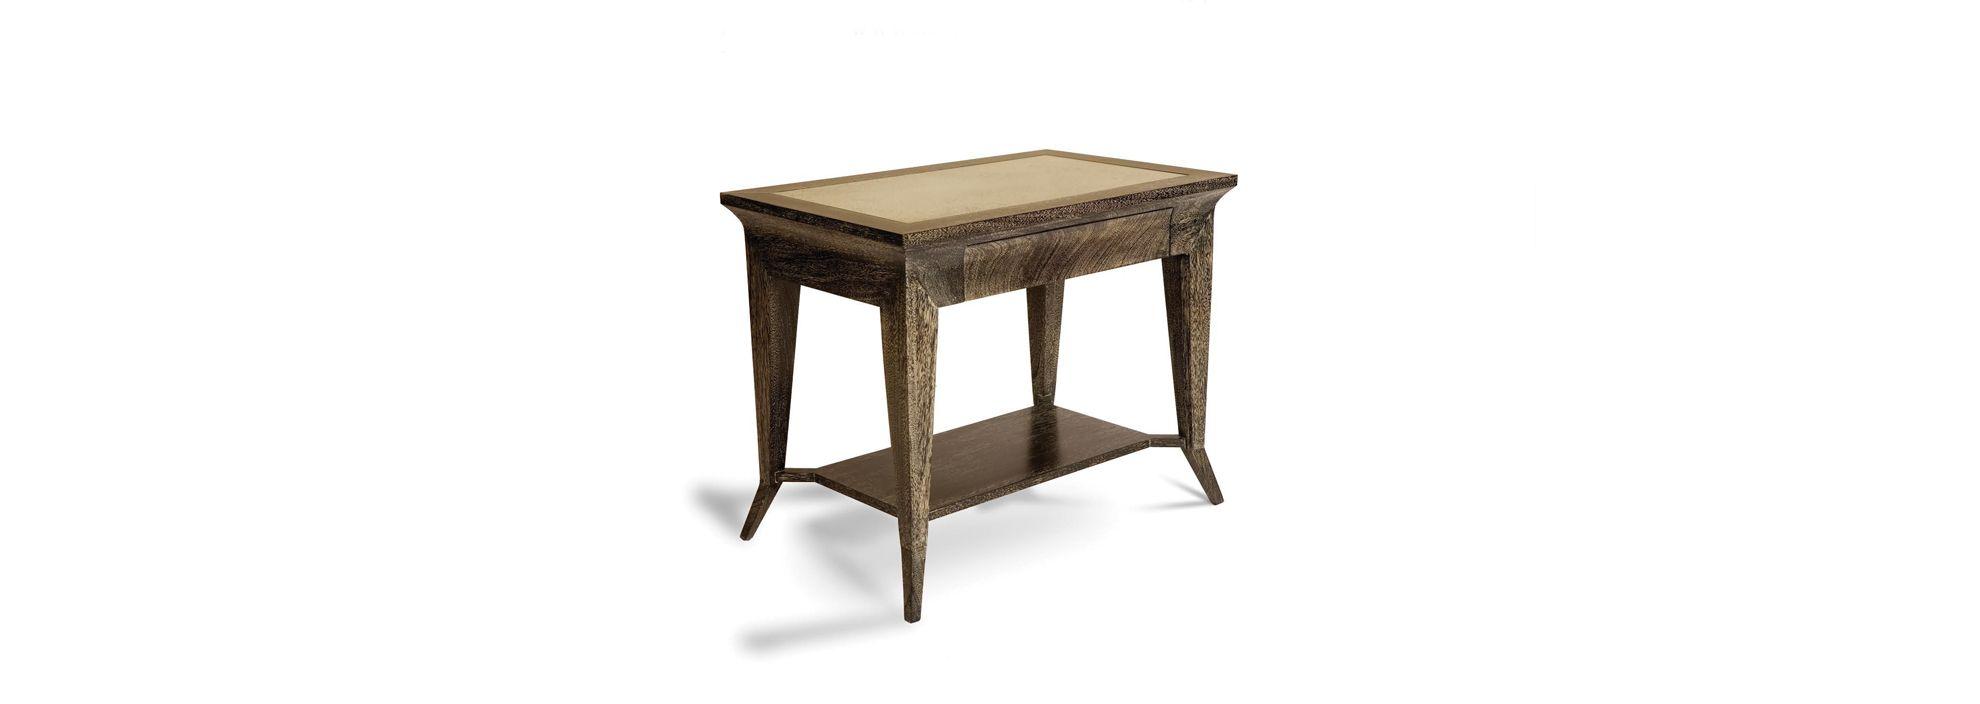 Emw Furniture Wkphh Com